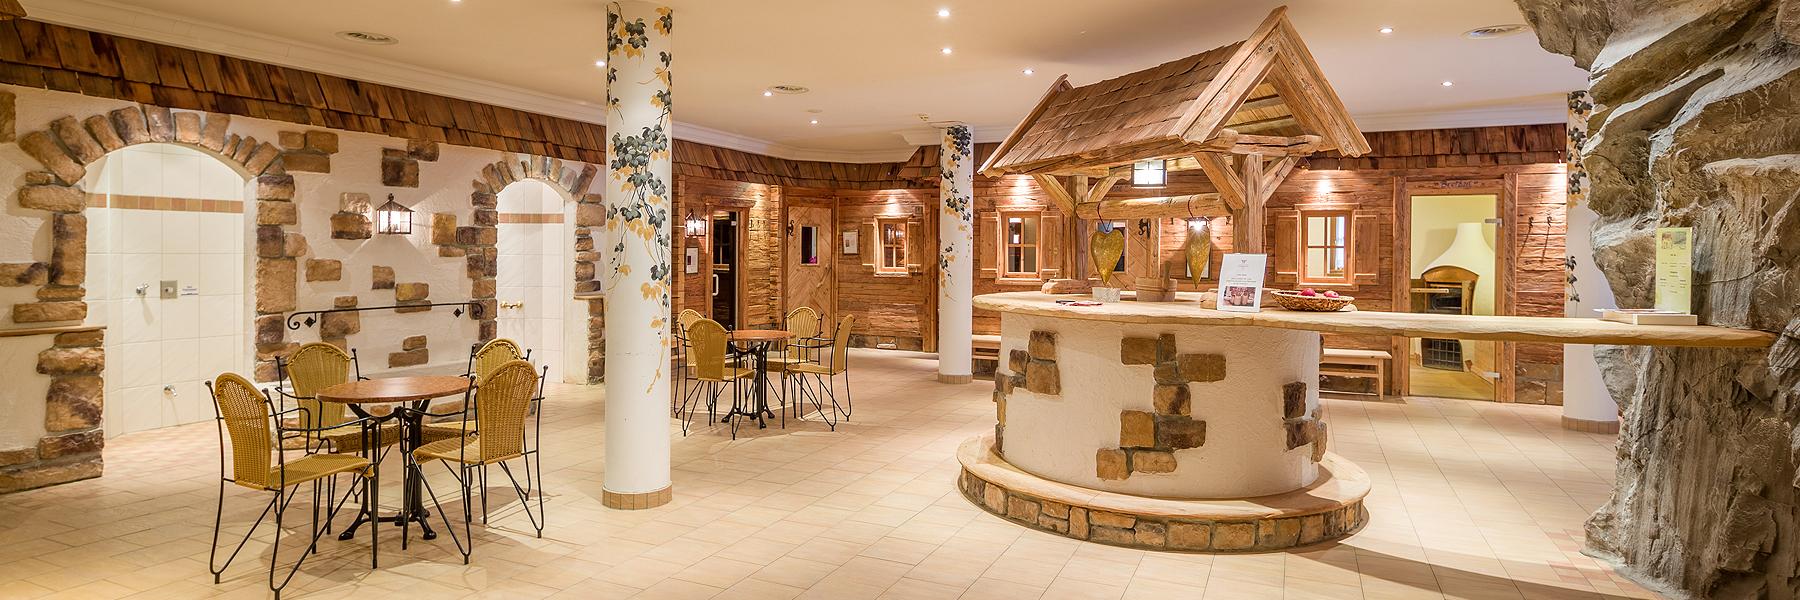 Saunawelt im Wellnesshotel Waidringer Hof in den Kitzbüheler Alpen